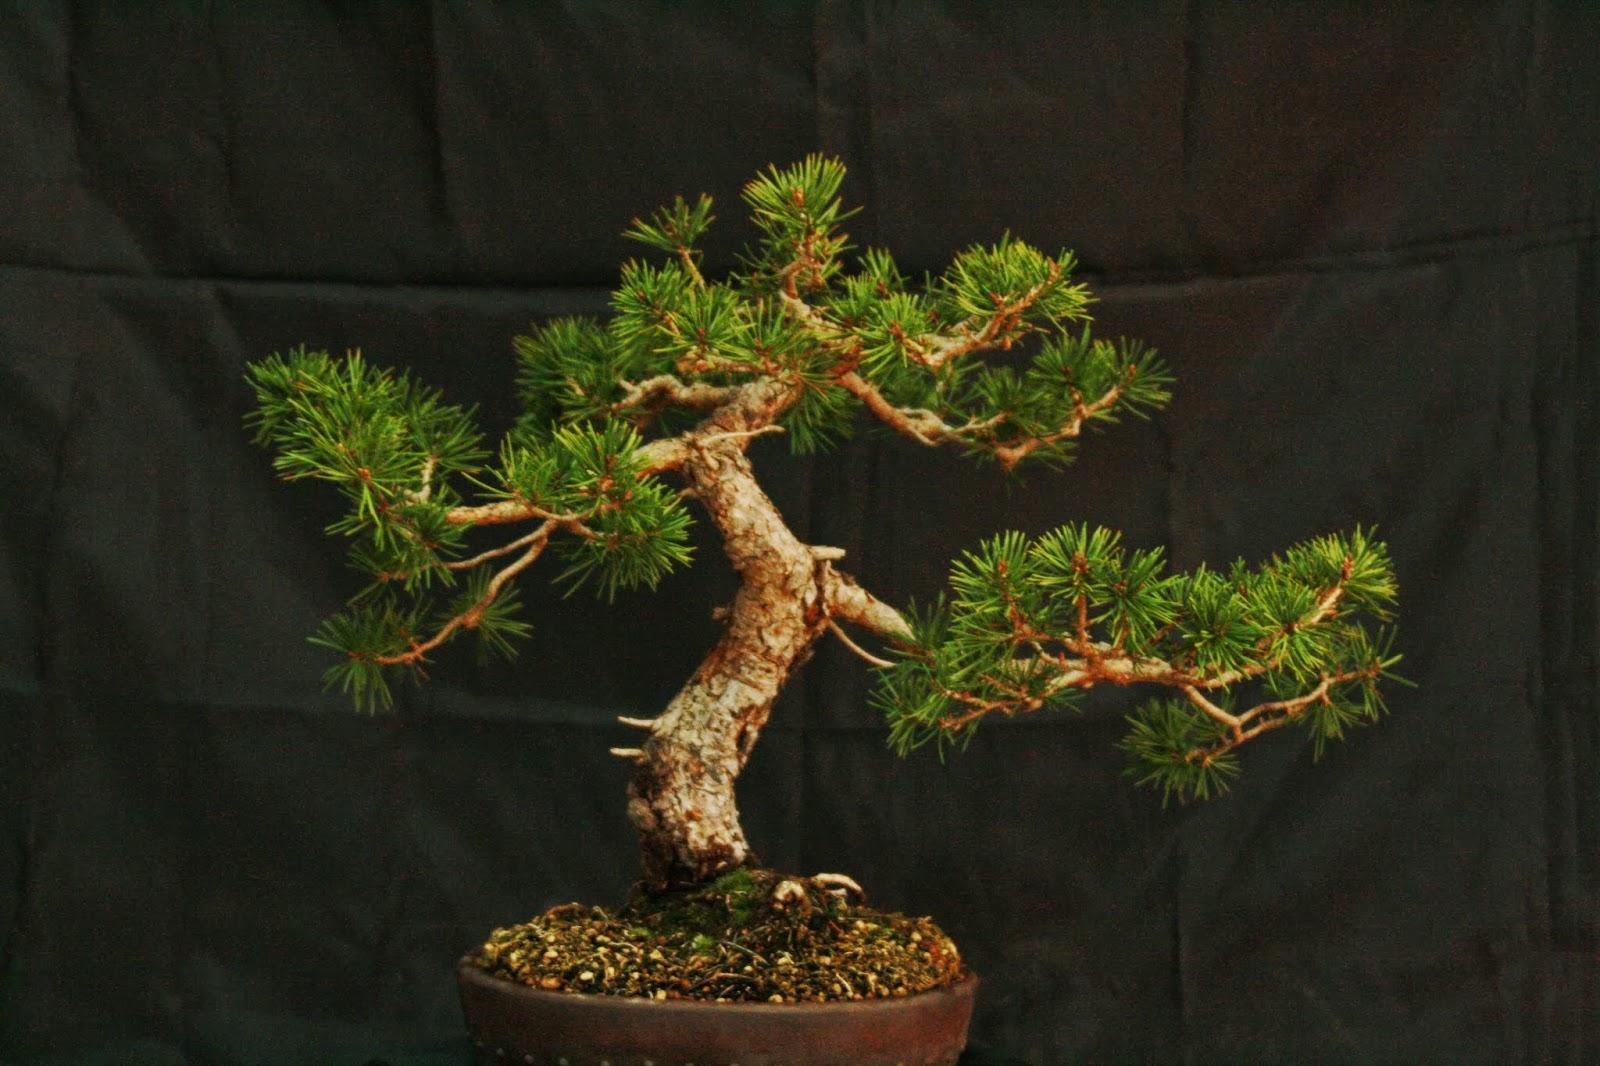 El pino de pepe escuela bonsai valencia for Bonsai pepe